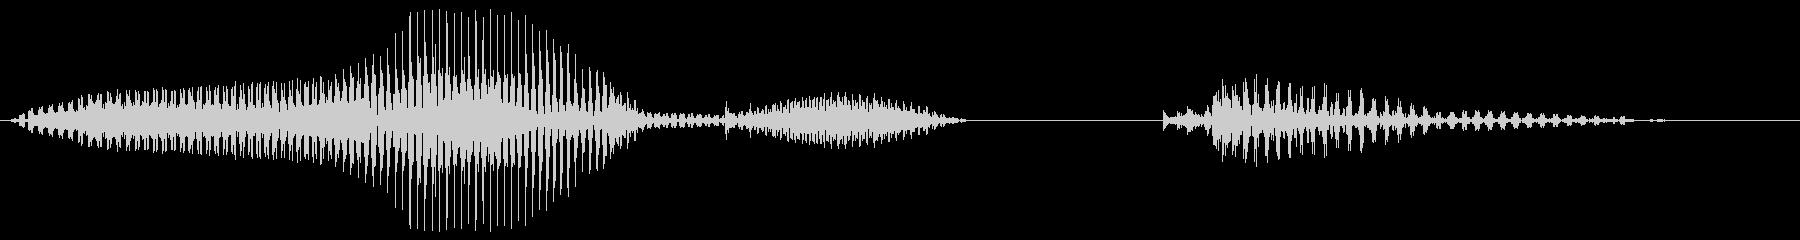 """Miyagi Prefecture"" (Miyagi Ken) 04's unreproduced waveform"